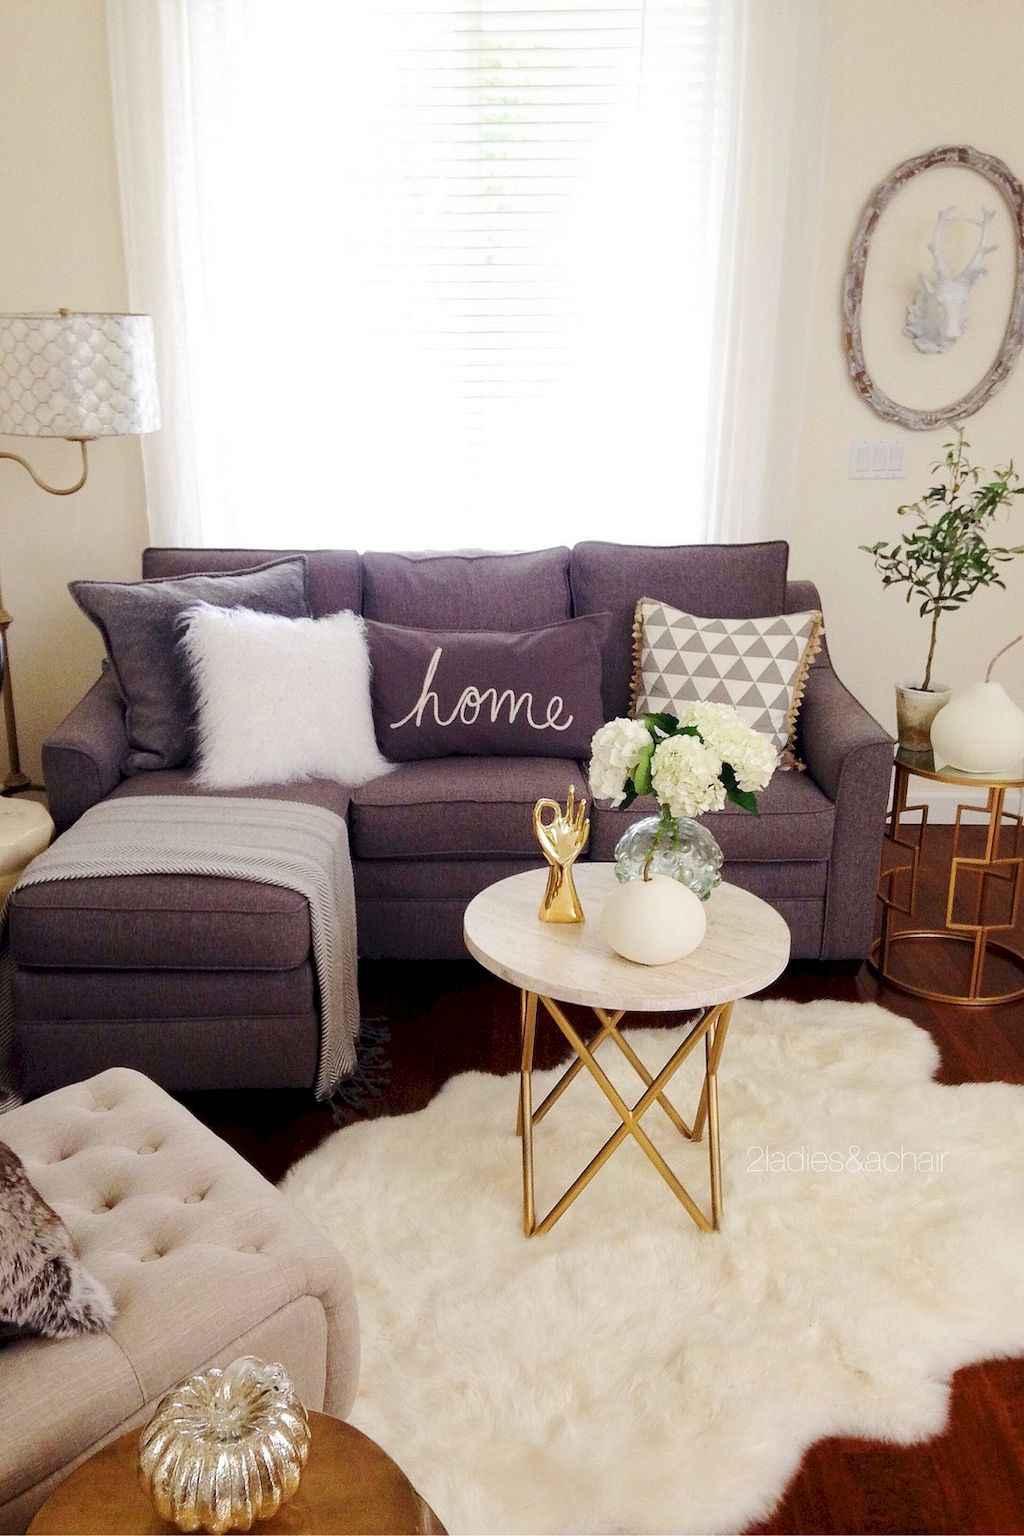 Small apartment decorating ideas (36)